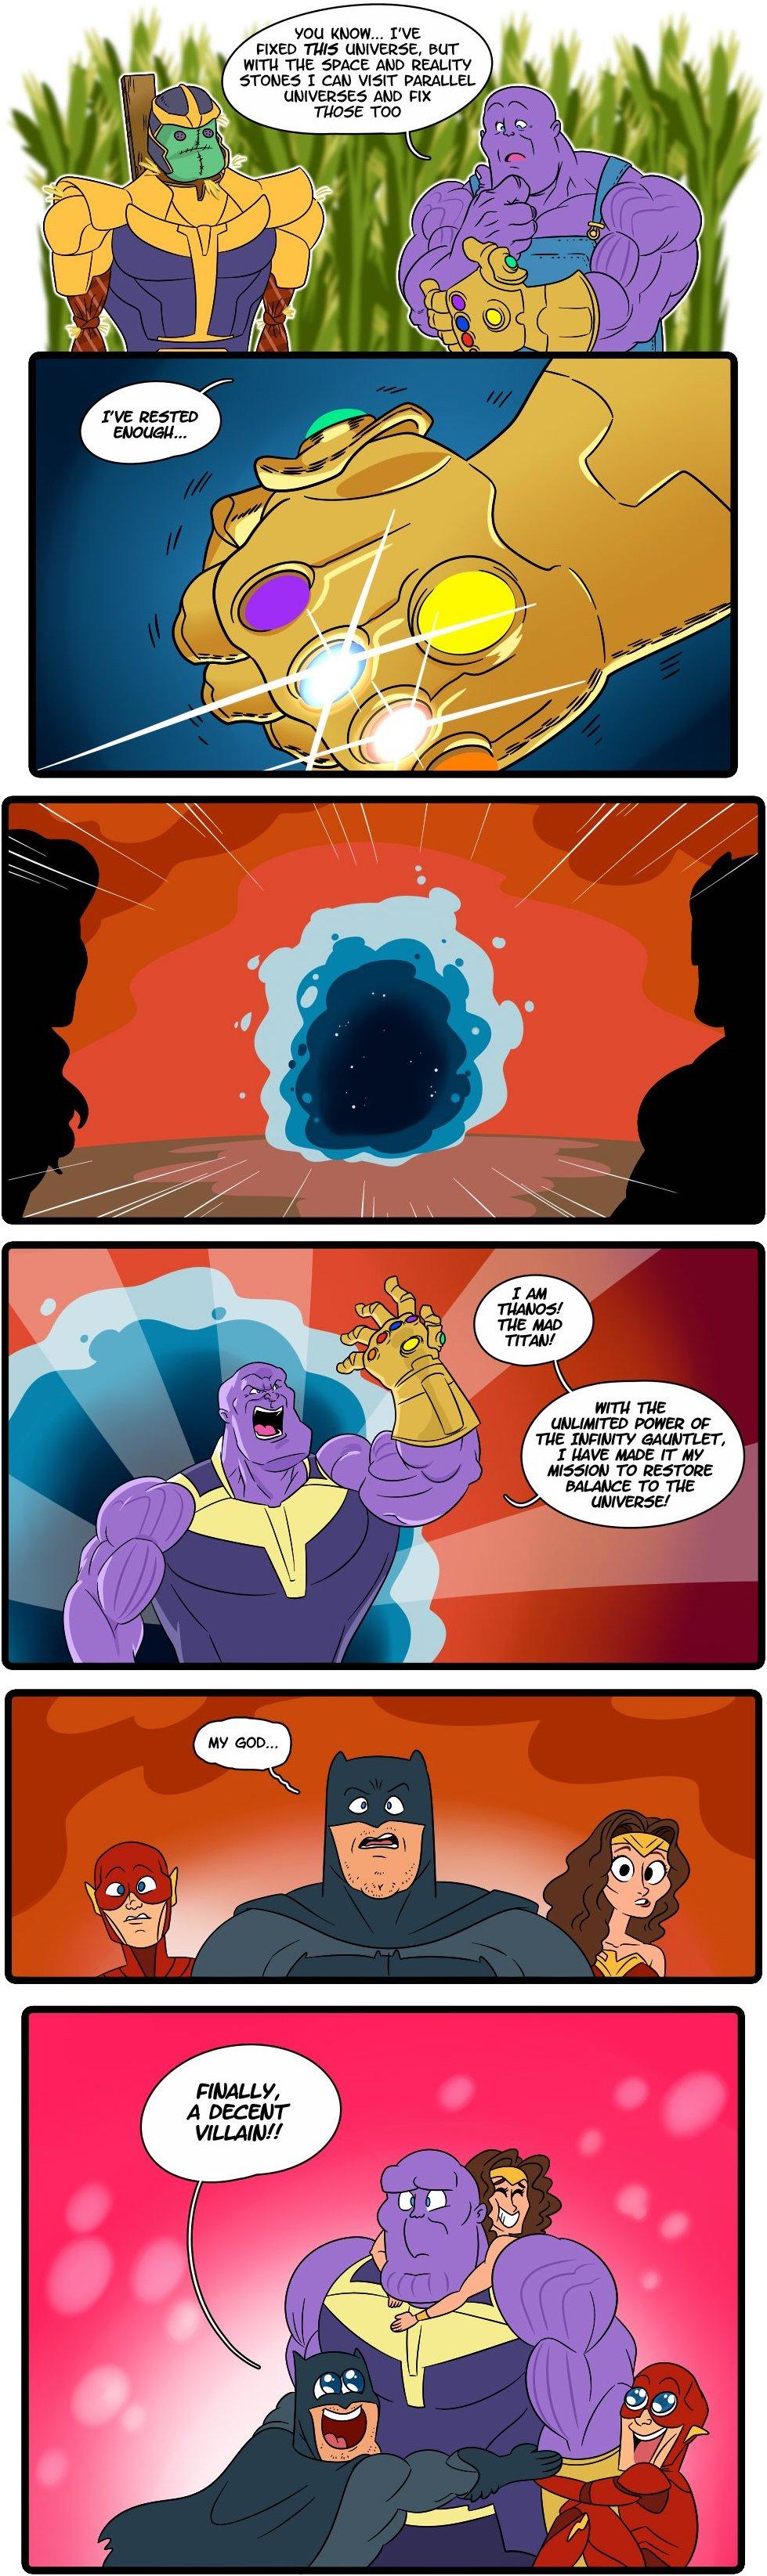 Thanos Batman Wonde Woman